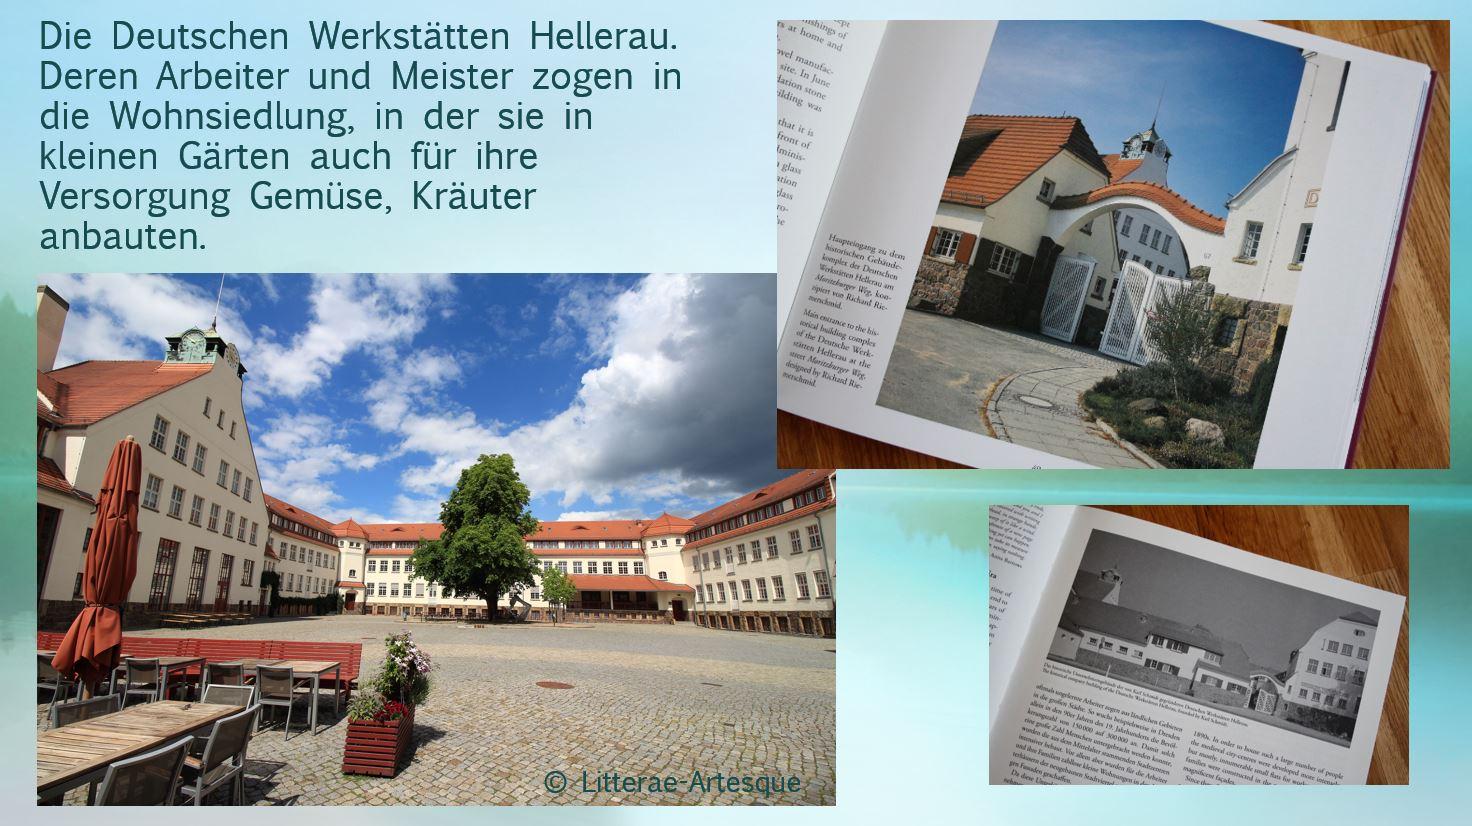 LITTERAE ARTESQUE: Golonska, C.; Elstner, F.: Hellerau